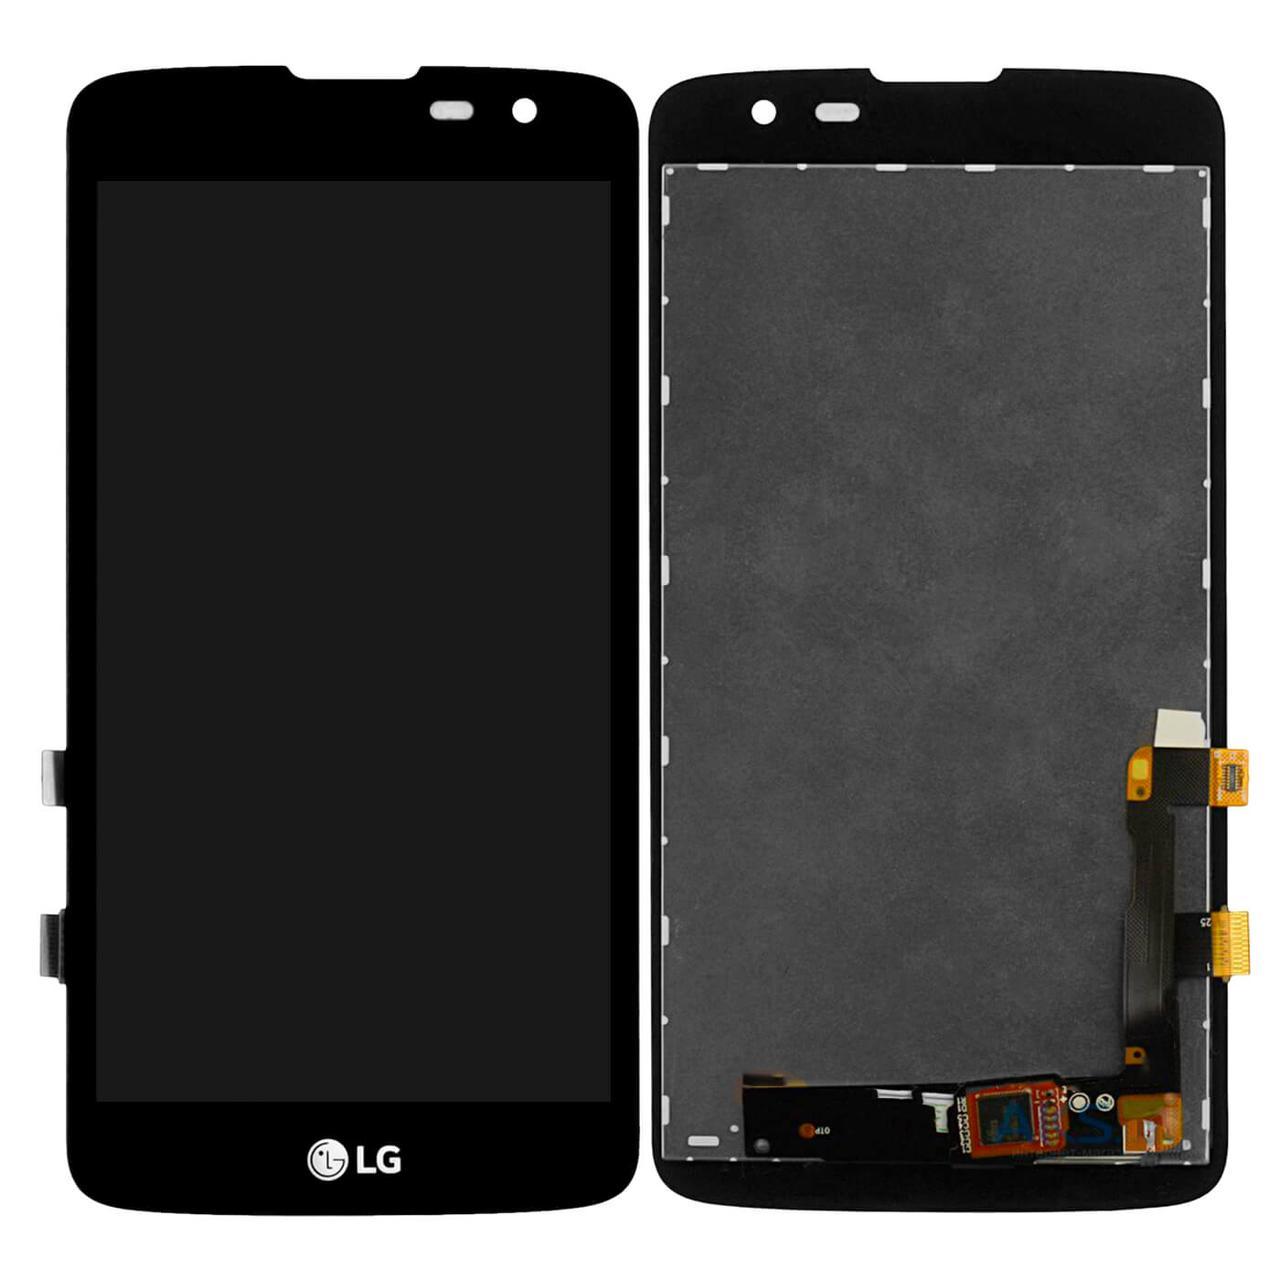 Дисплей в сборе для LG Q7, black